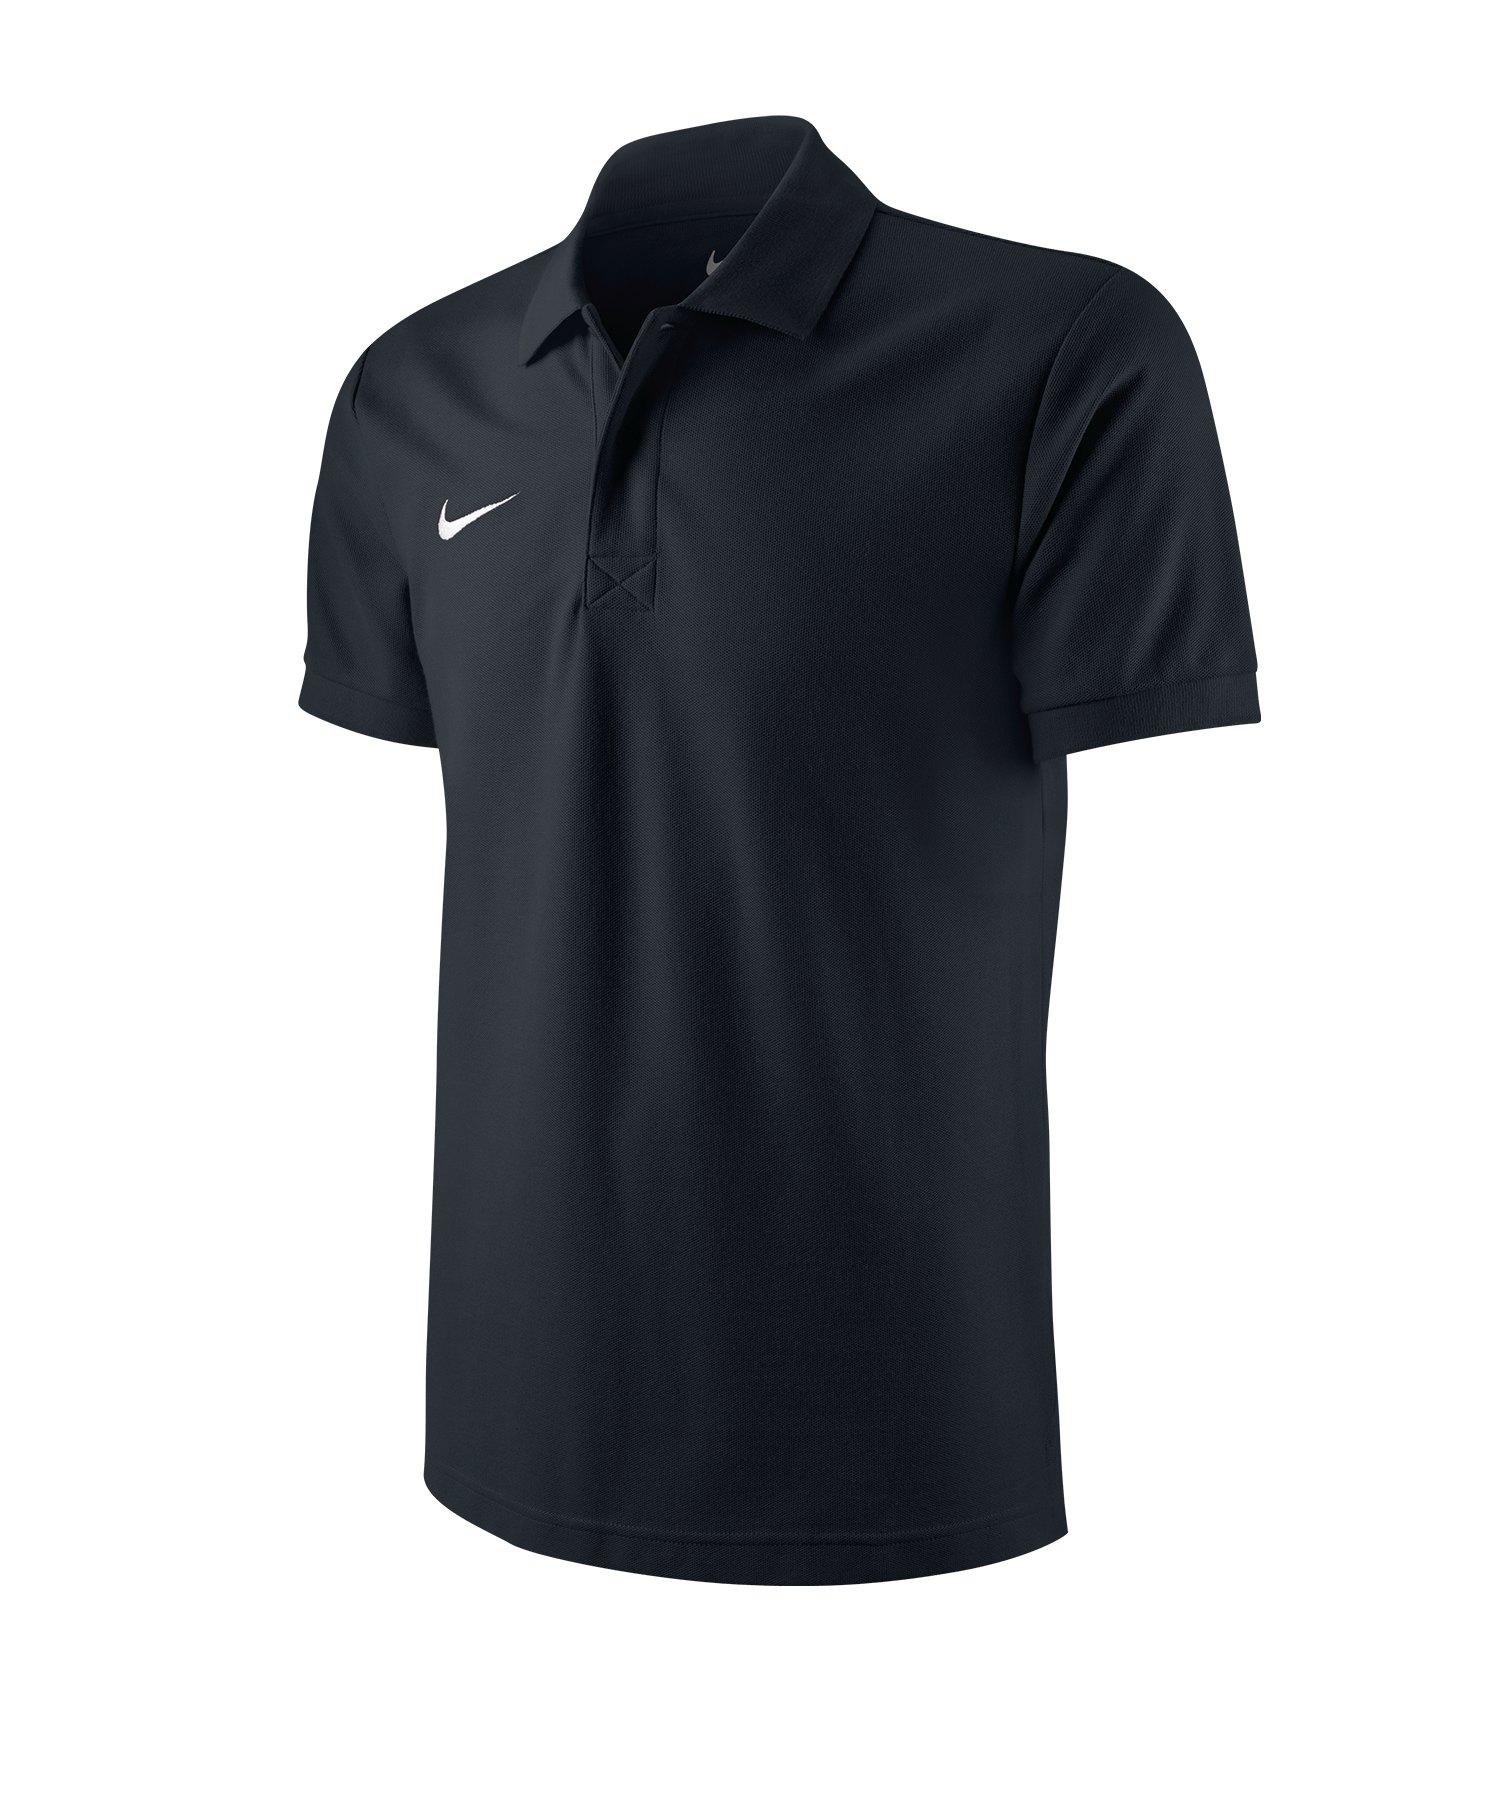 Nike Poloshirt TS Core Mens Polo Schwarz F010 - schwarz